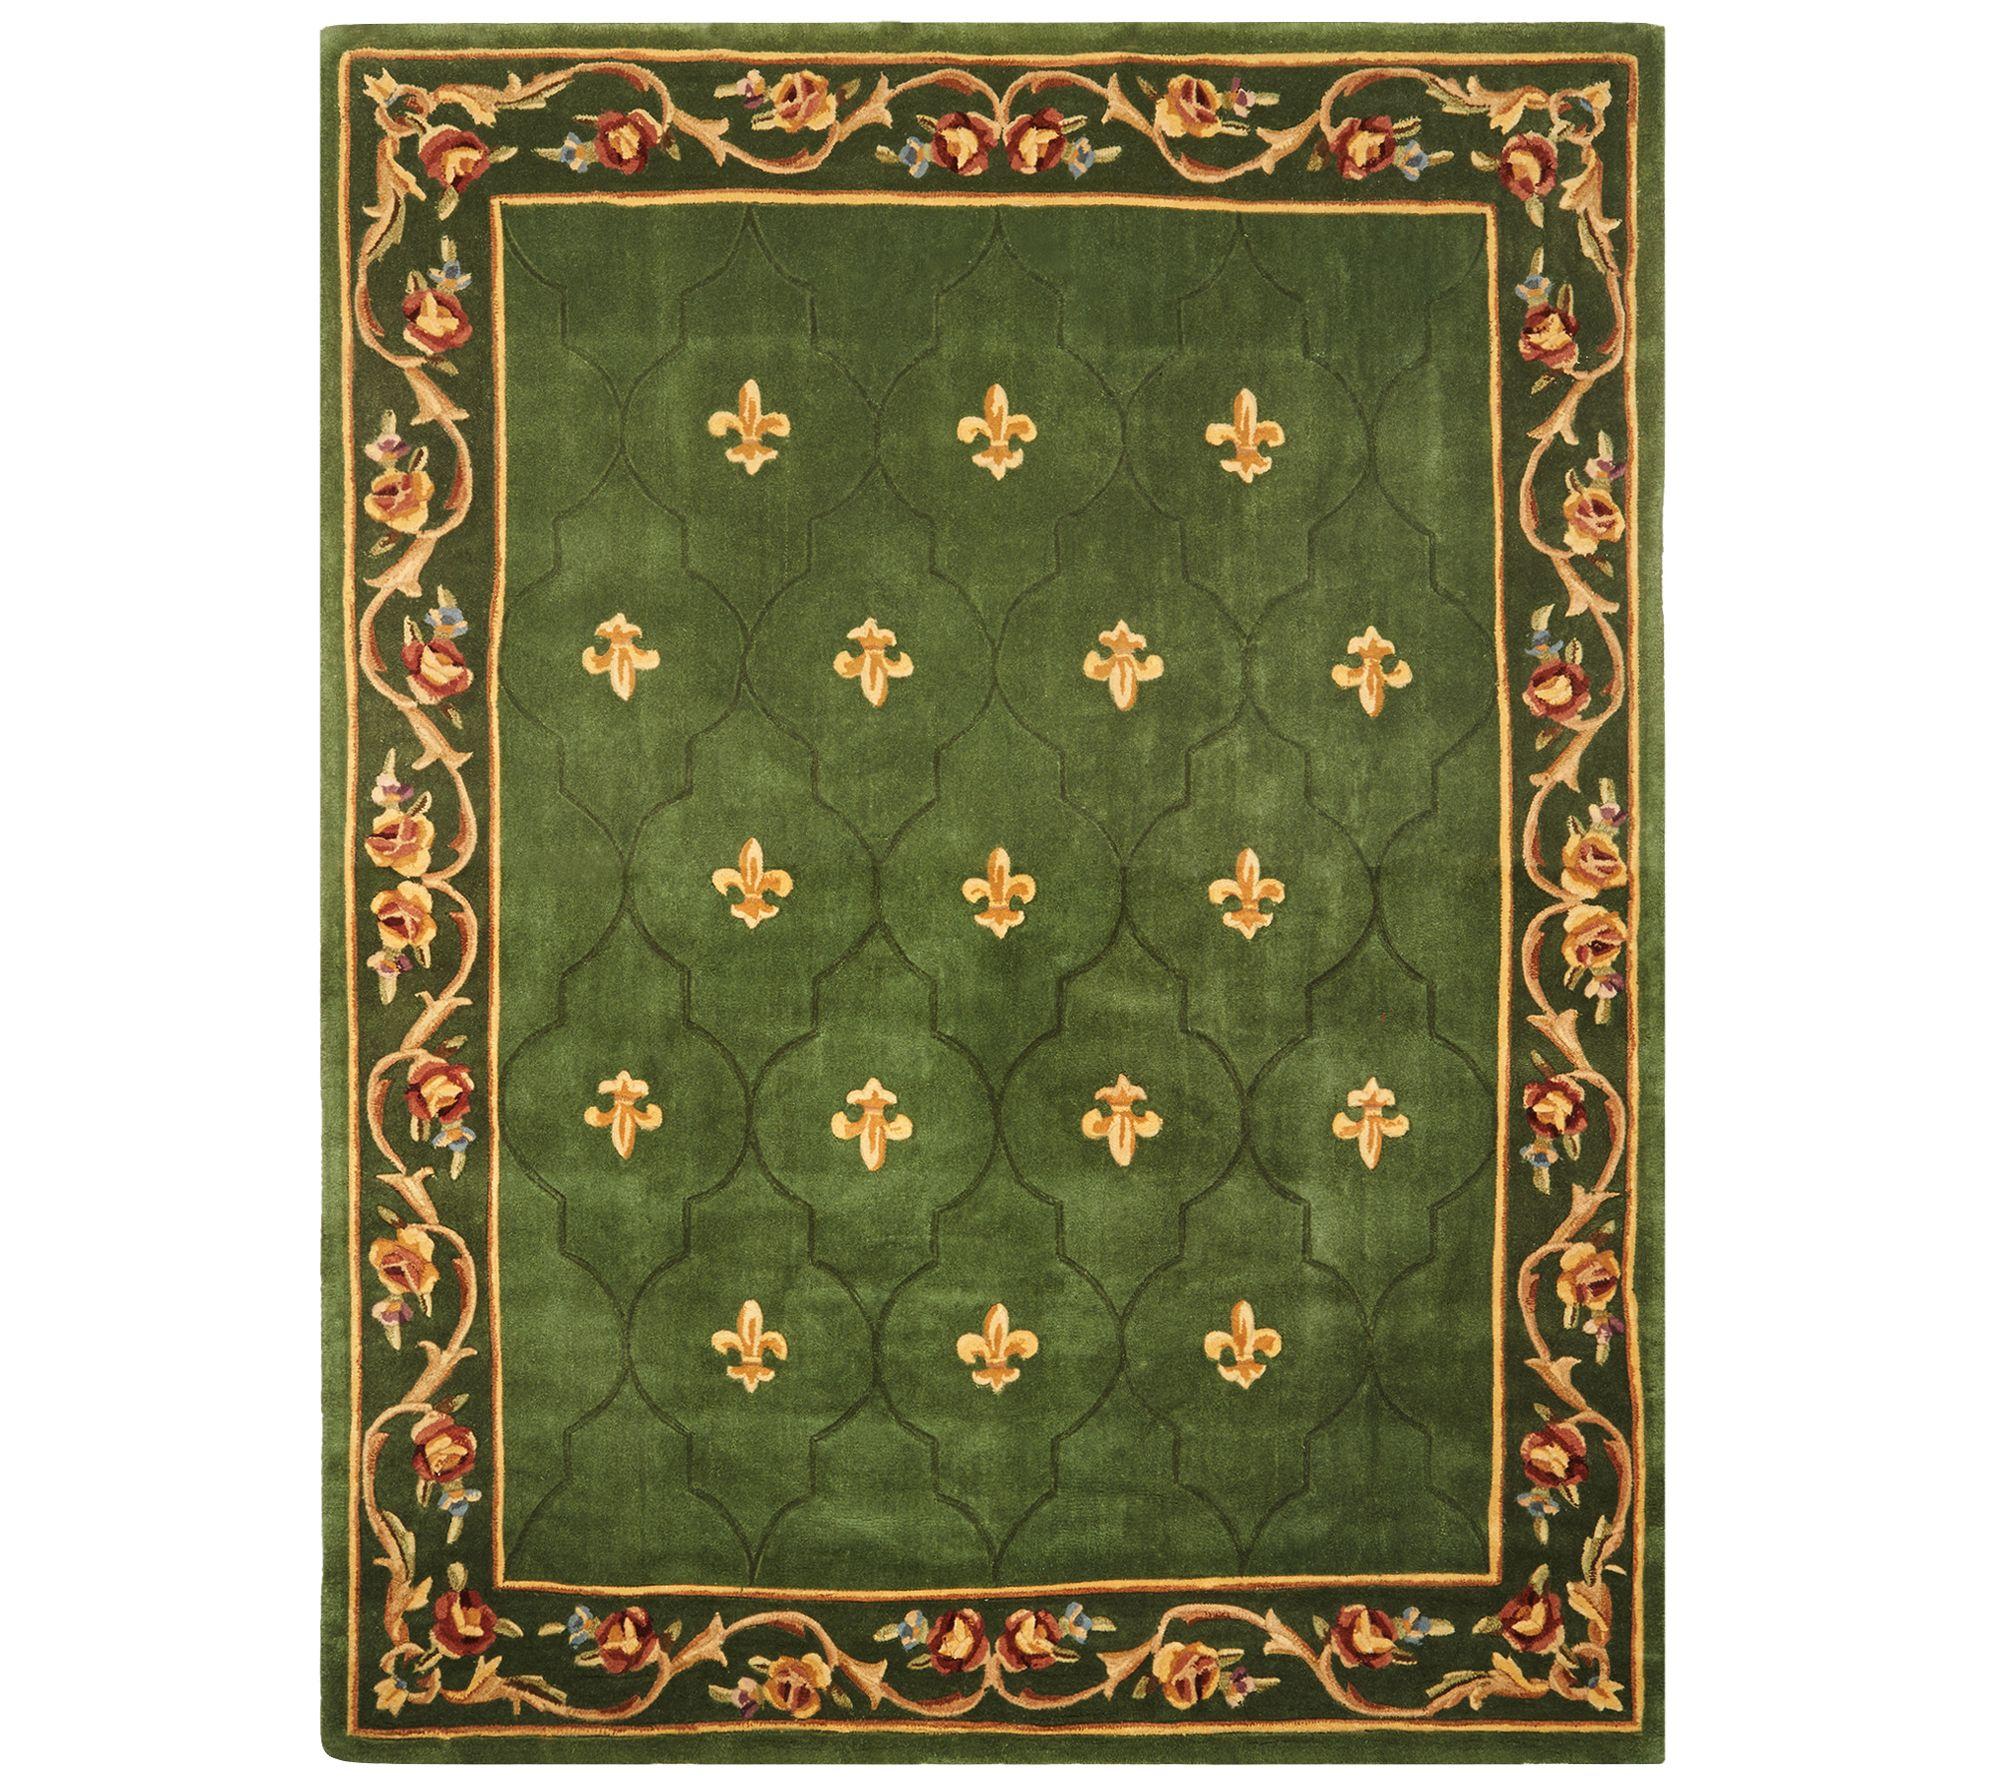 Royal Palace Special Edition 7'x9' Fleur De Lis Wool Rug